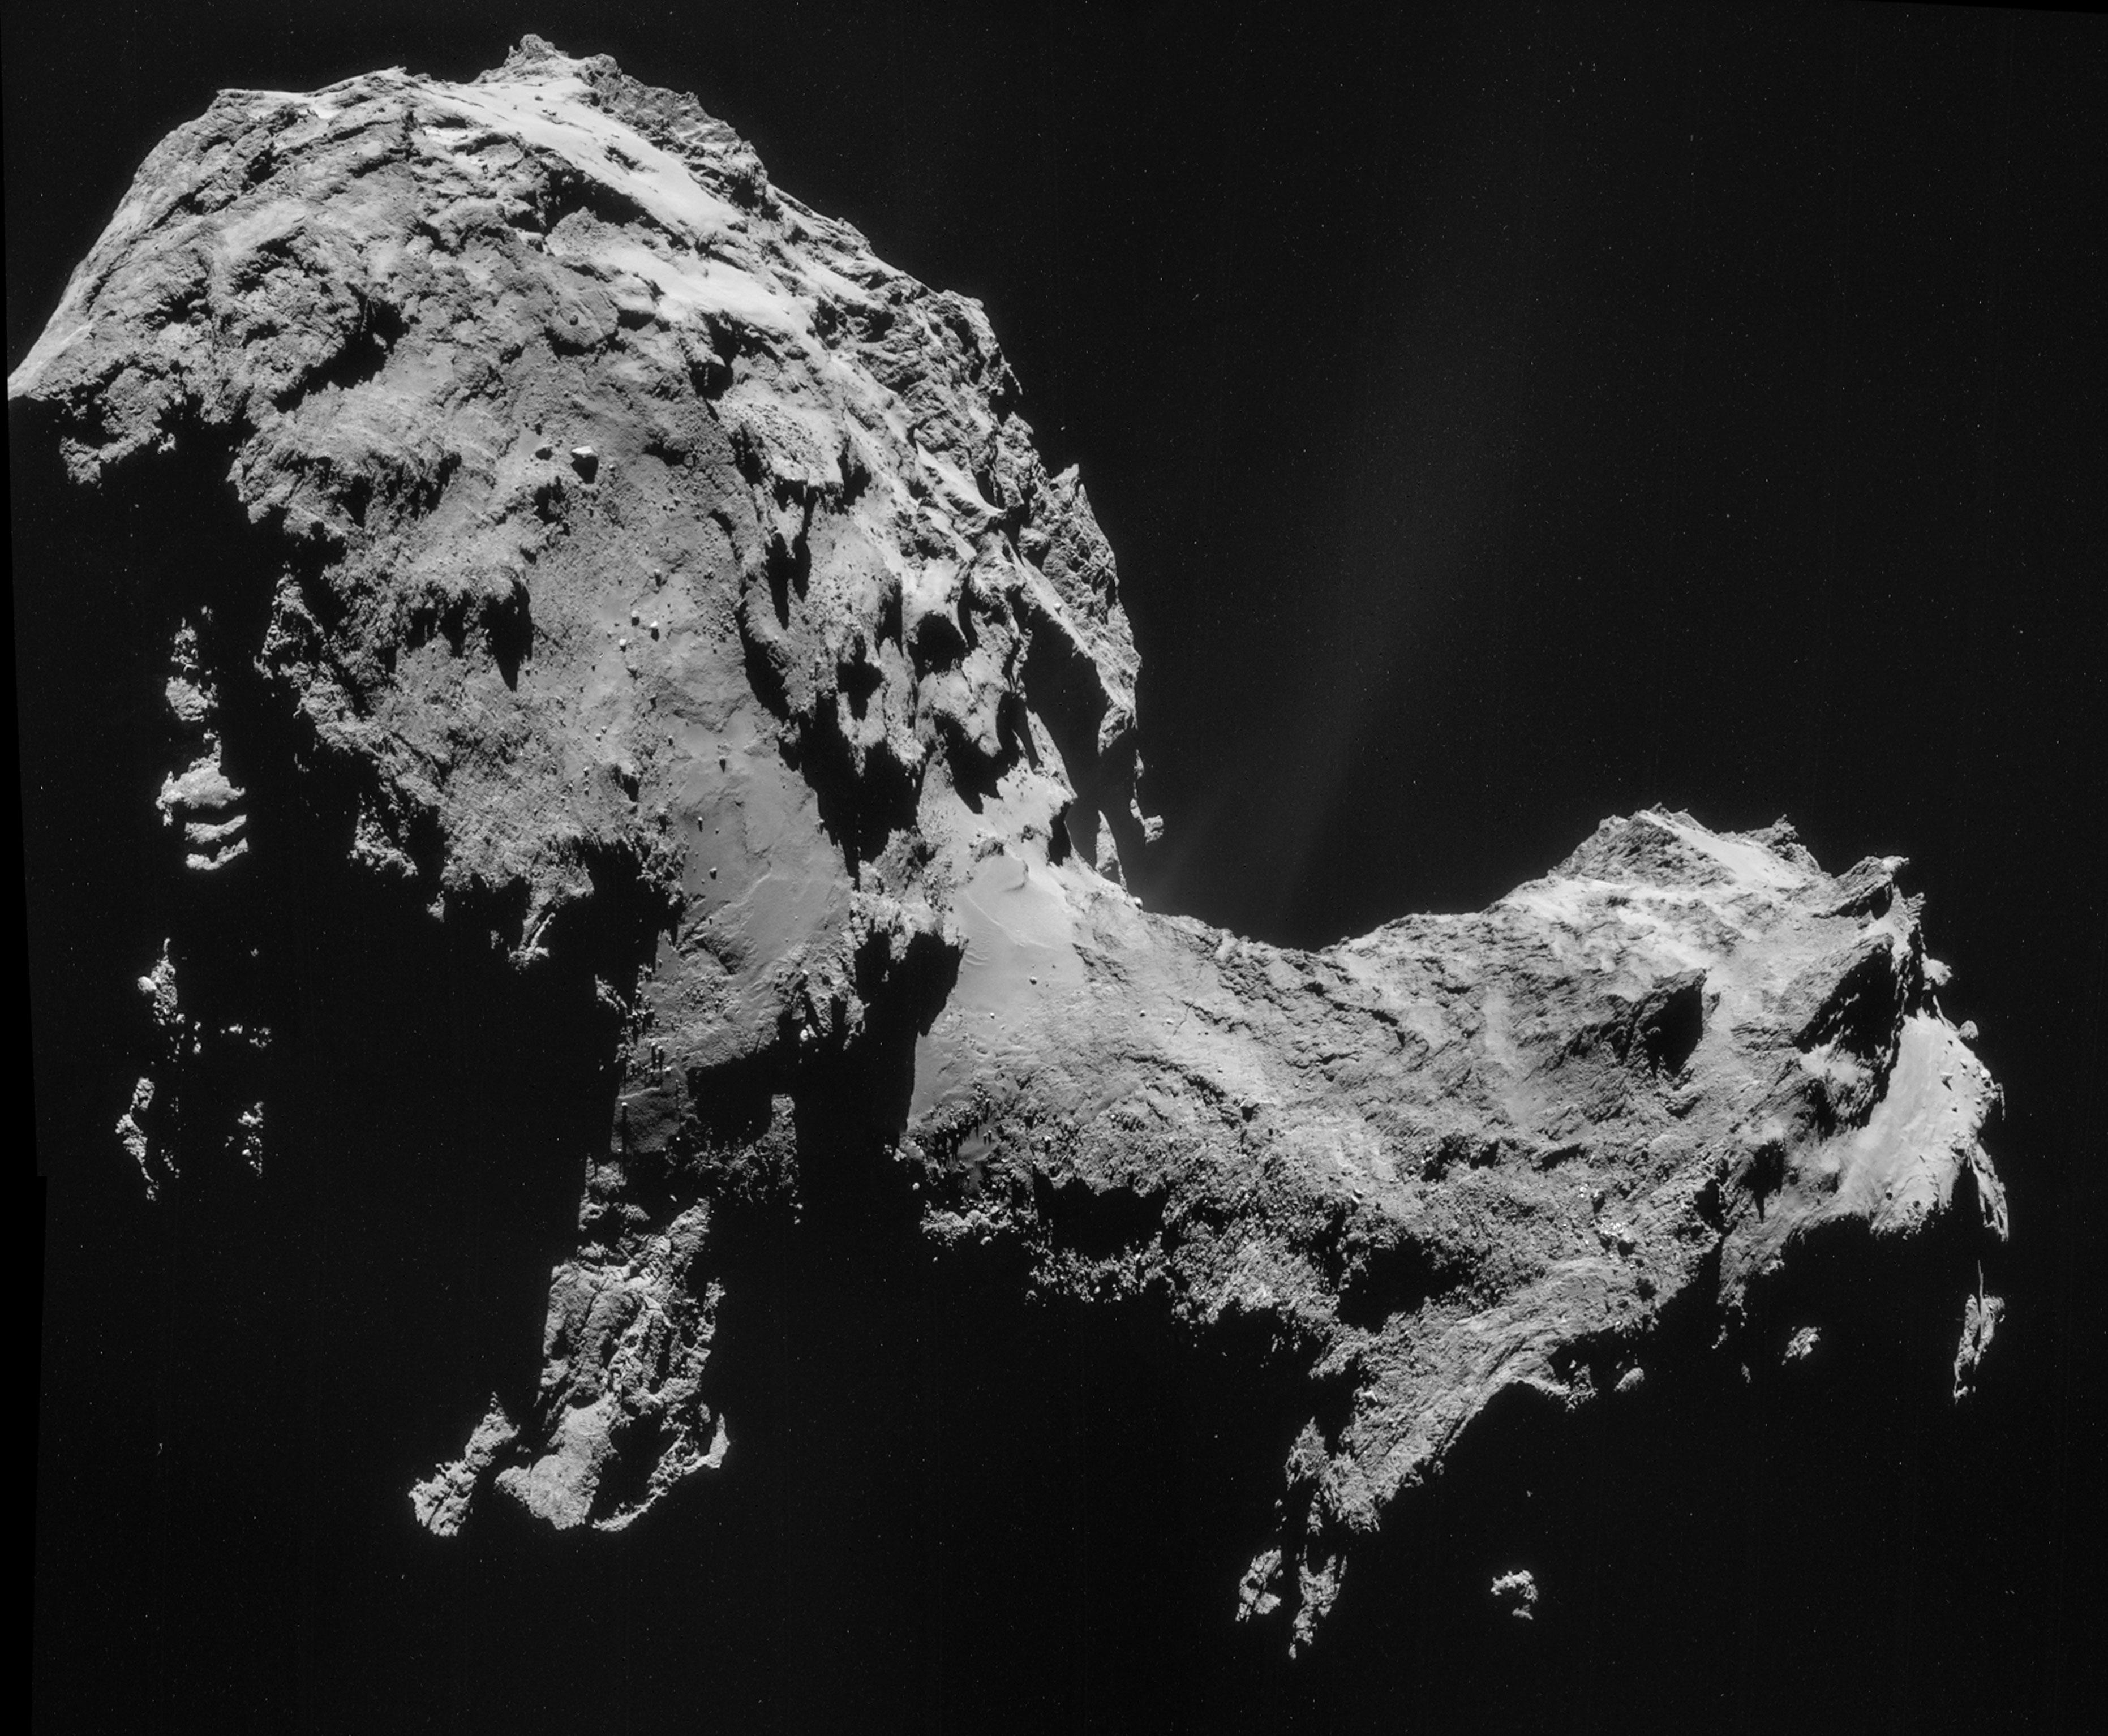 Four-image NAVCAM mosaic of Comet 67P/Churyumov-Gerasimenko, using images taken on 19 September 2014 when Rosetta was 28.6 km from the comet. Credit: ESA/Rosetta/NAVCAM